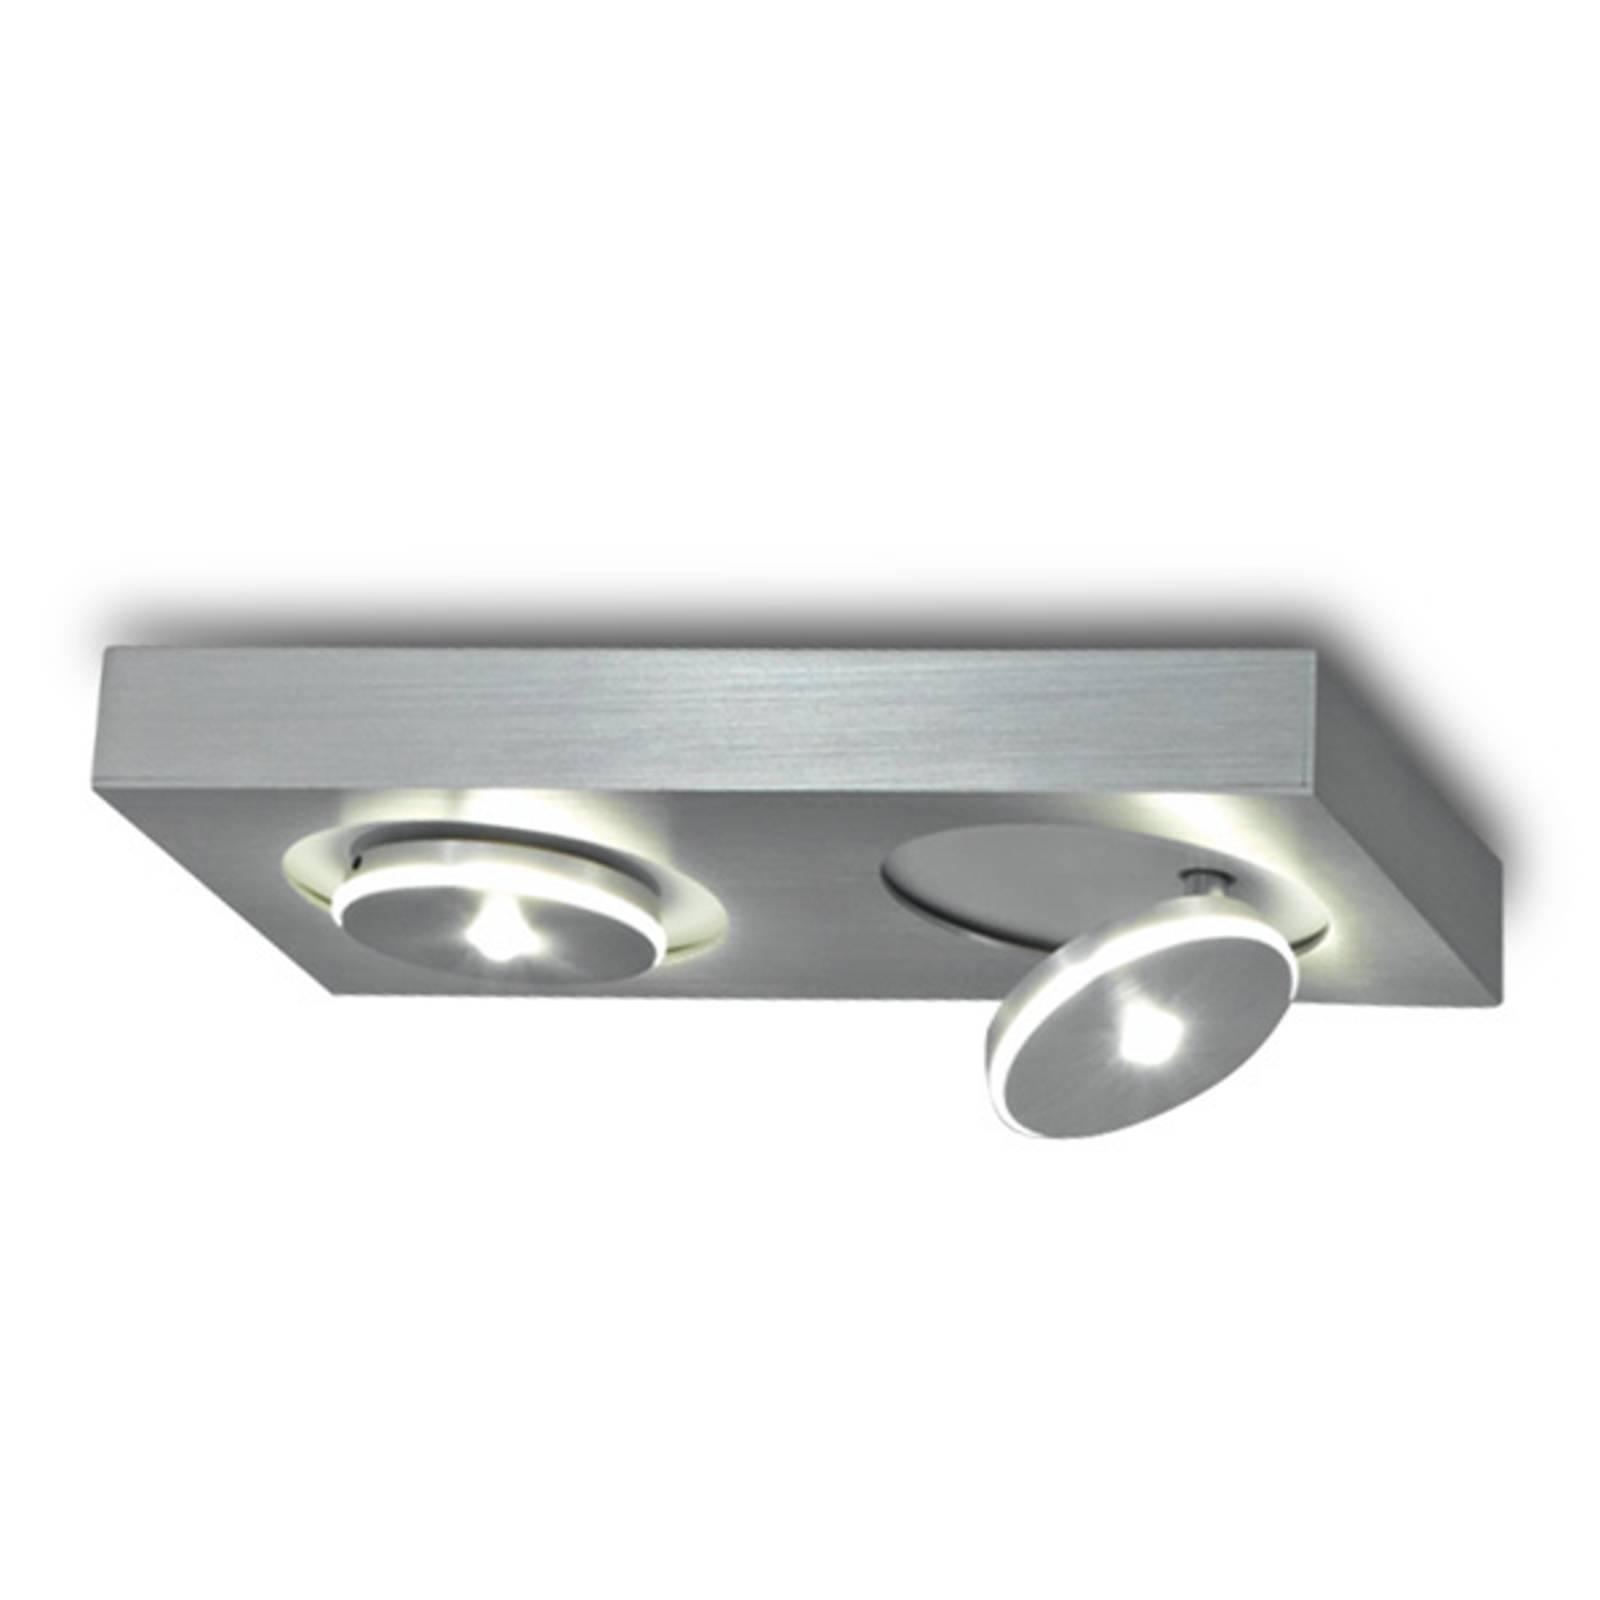 Escale Spot It, moderni LED-kattovalaisin